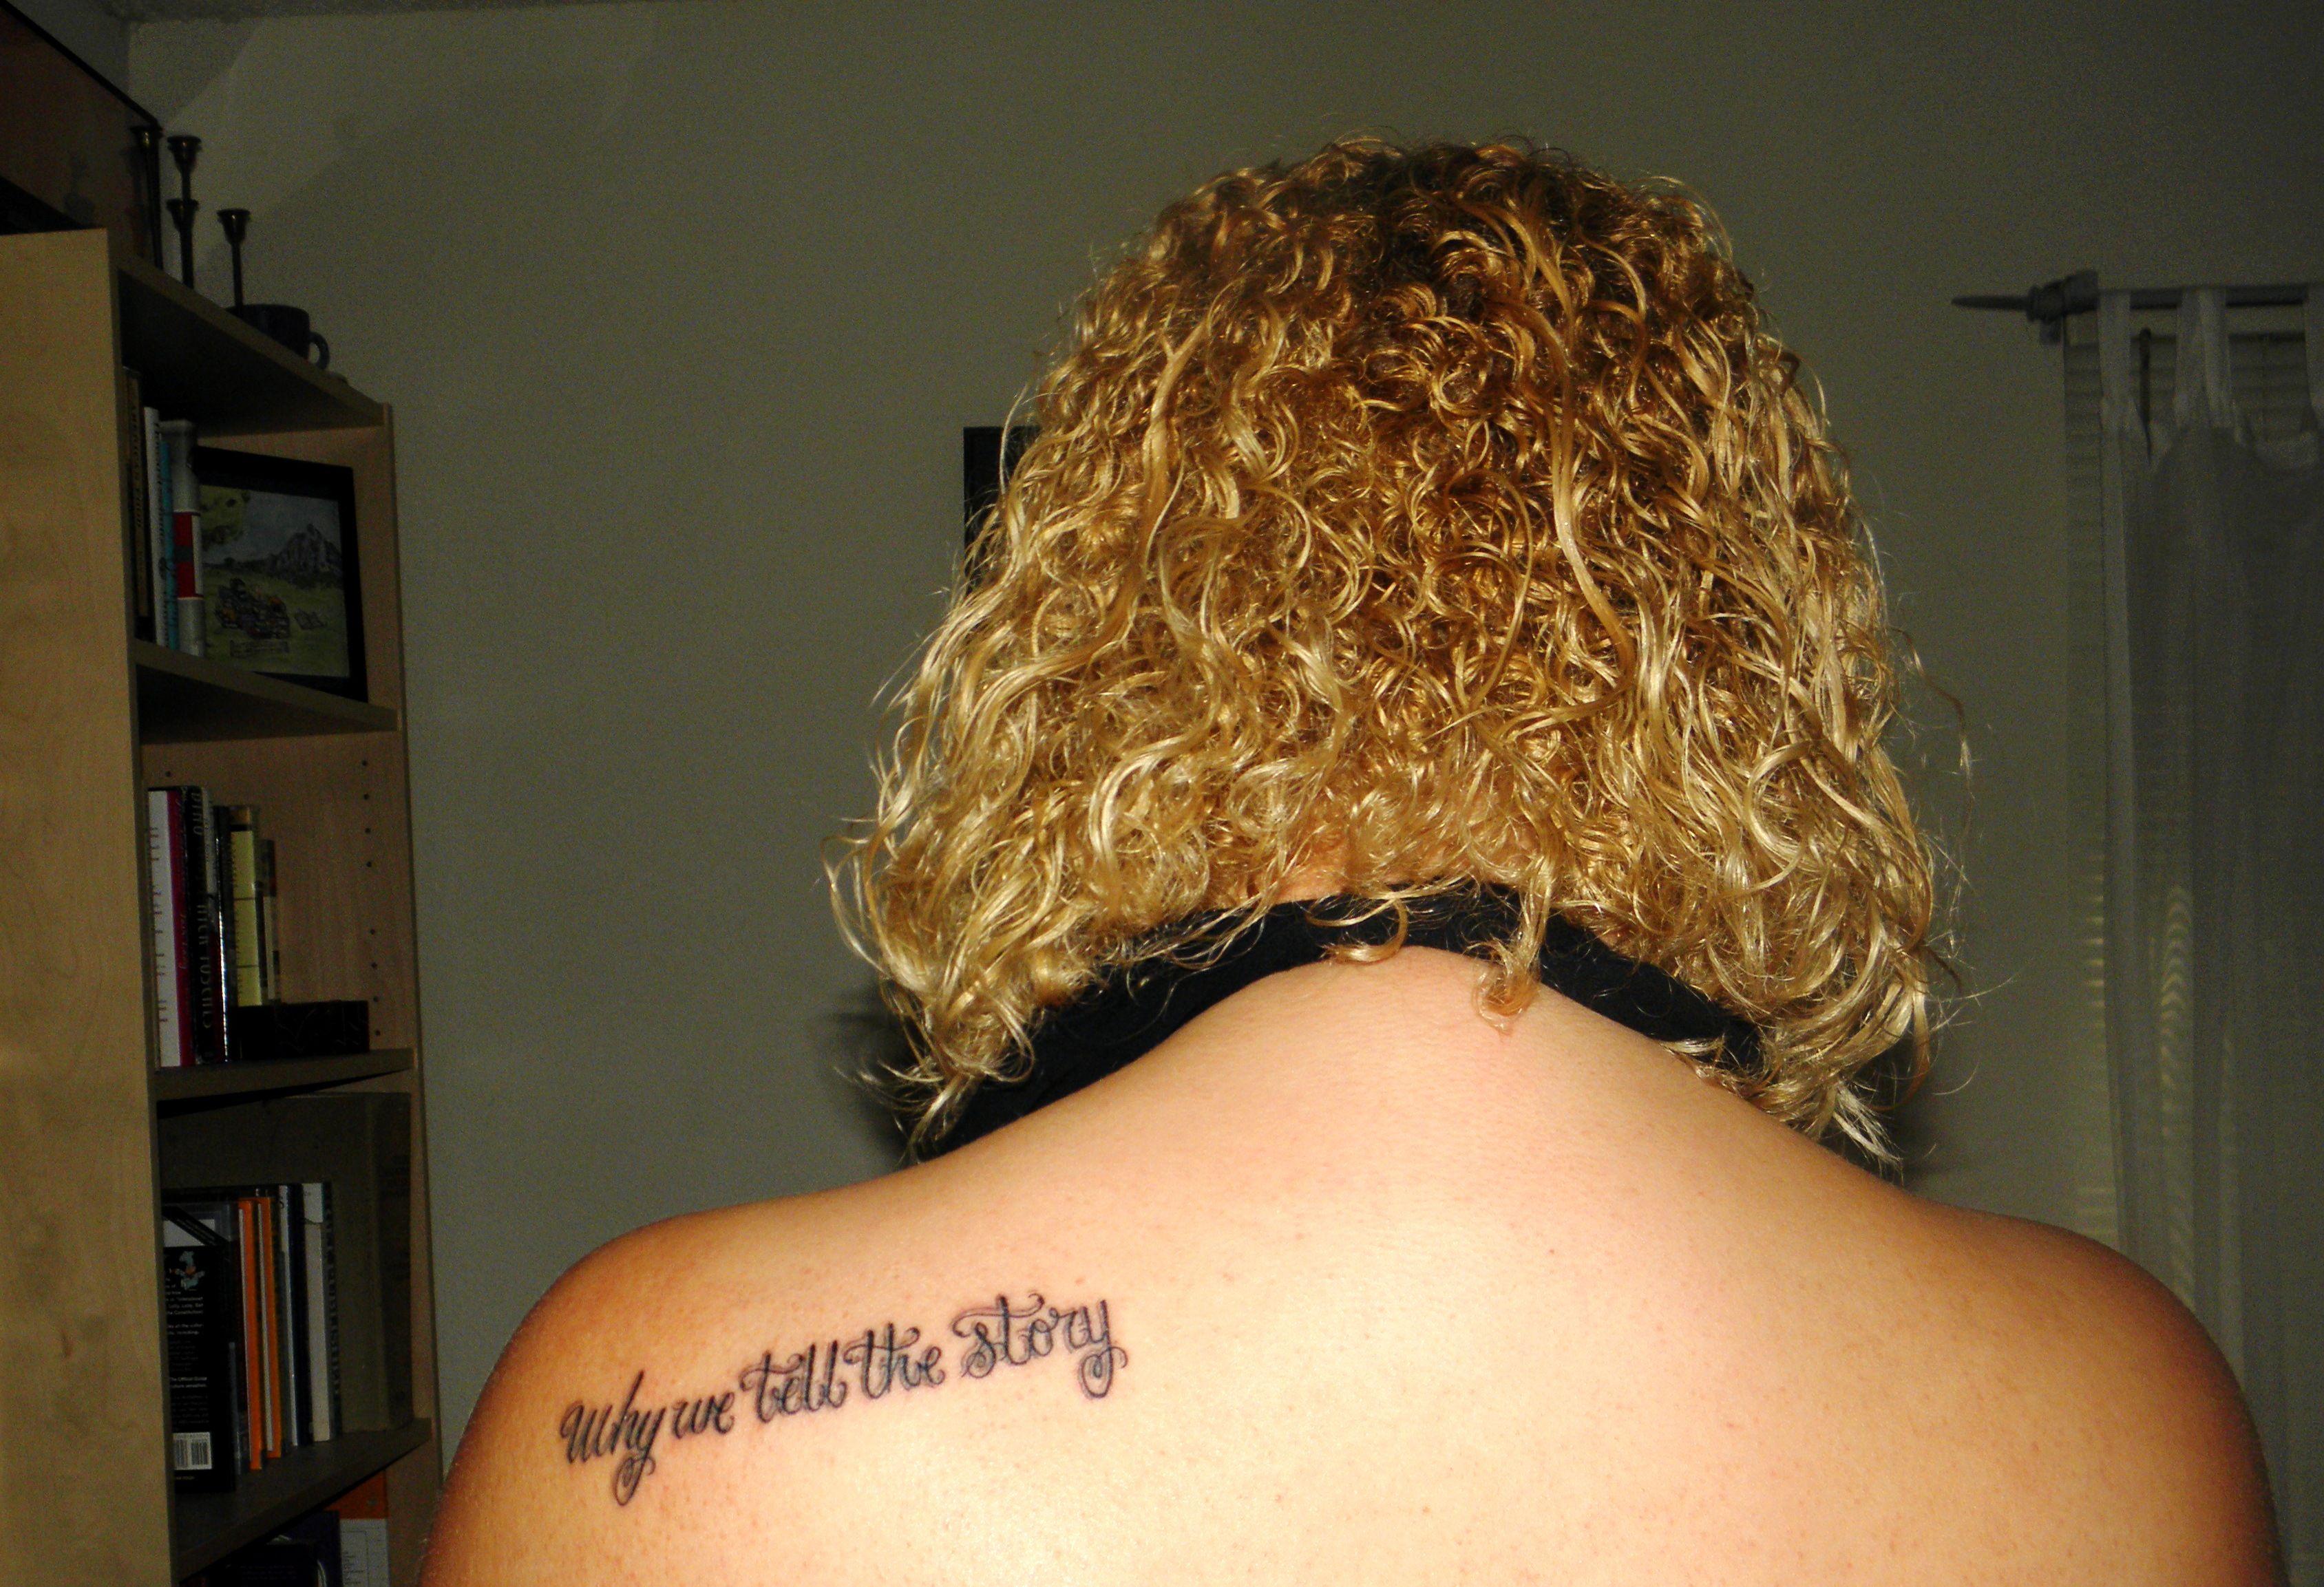 Once On This Island tattoo May 2012 musical lyrics